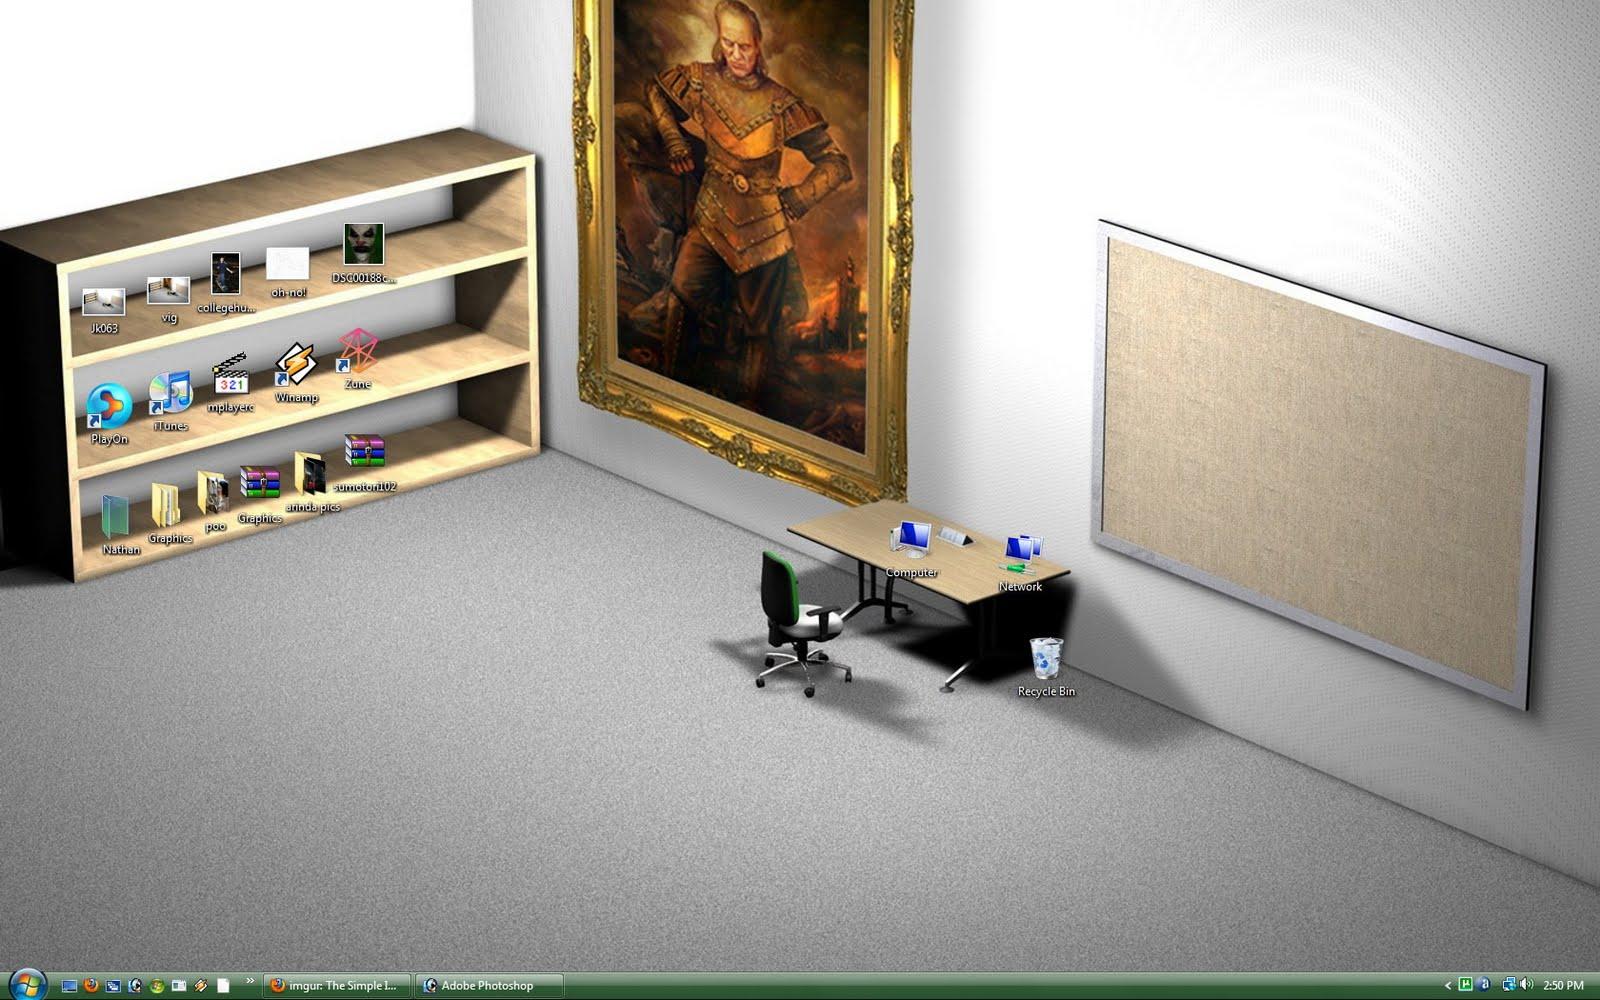 http://4.bp.blogspot.com/_oyDRus0HKls/S634oZNn6LI/AAAAAAAABSk/xwrg-TsBkyE/s1600/wallpaper_arrangement.jpg